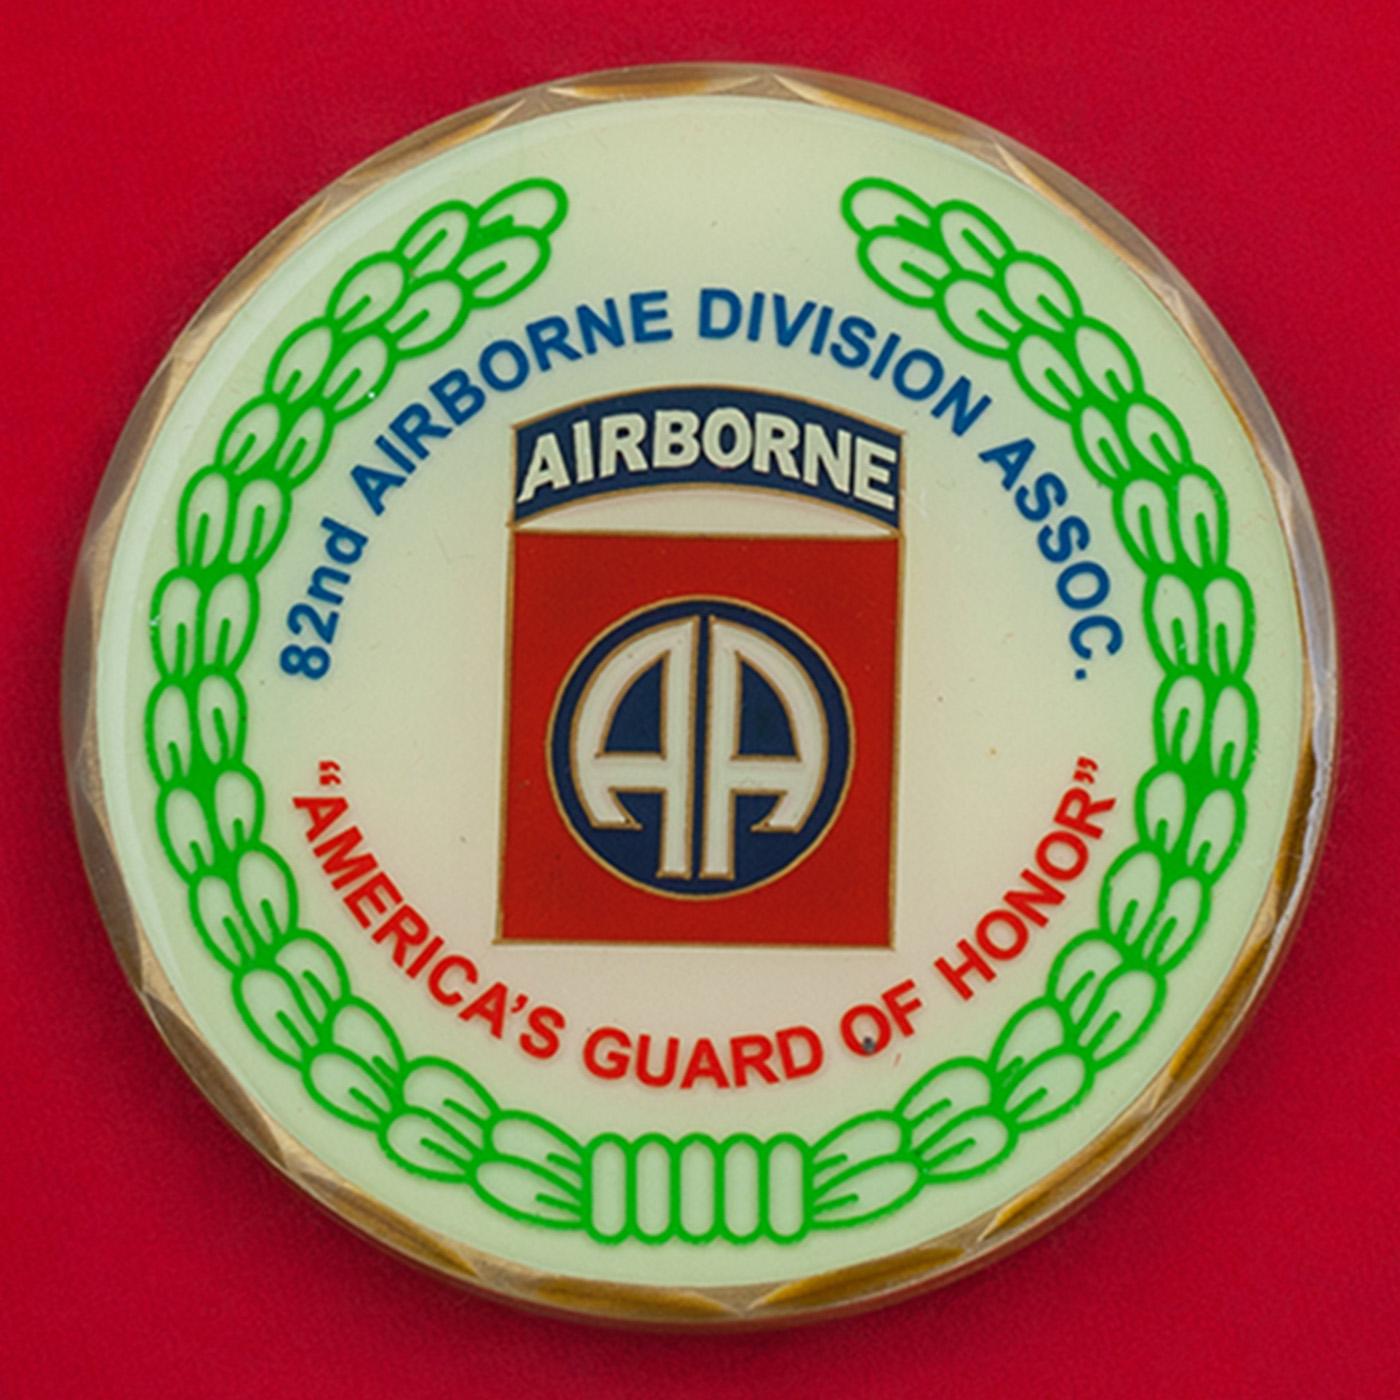 Челлендж коин 82-й воздушно-десантной дивизии Армии США